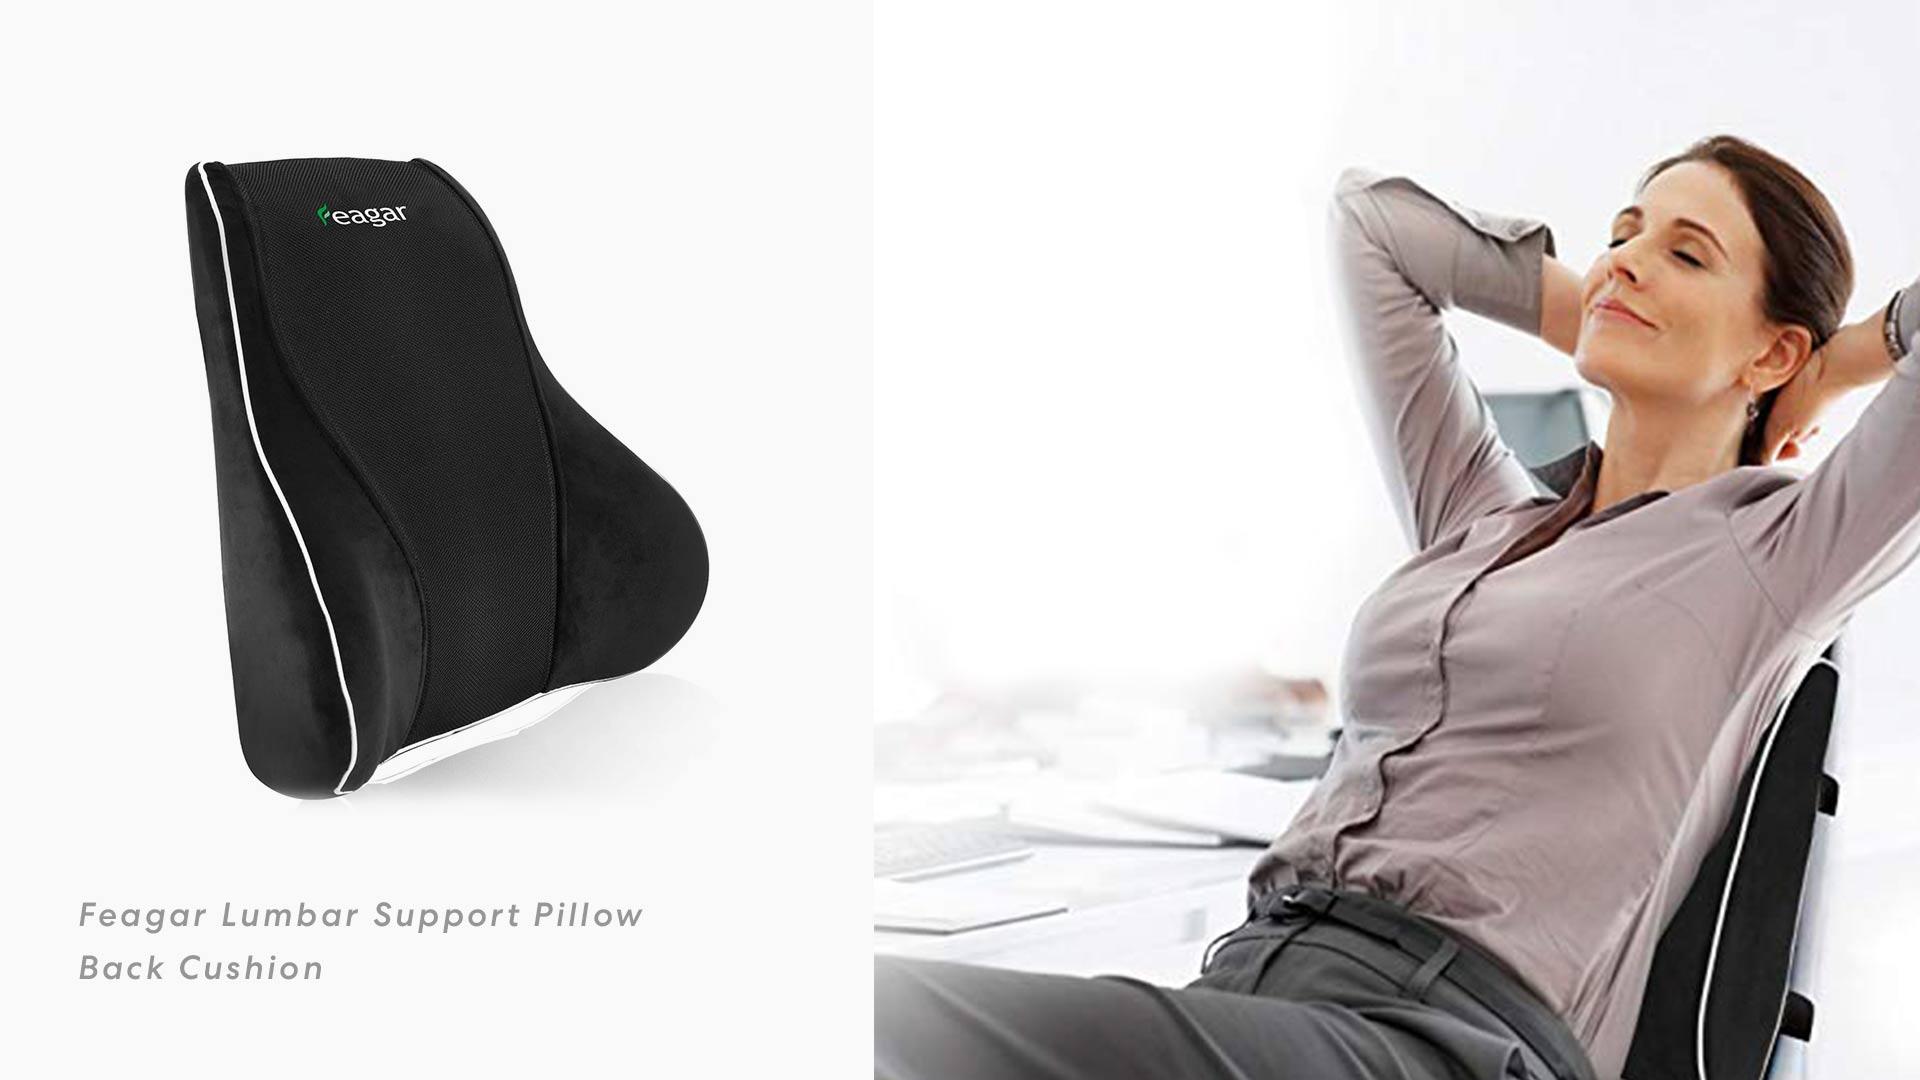 Cushion Feagar Lumbar Support Pillow